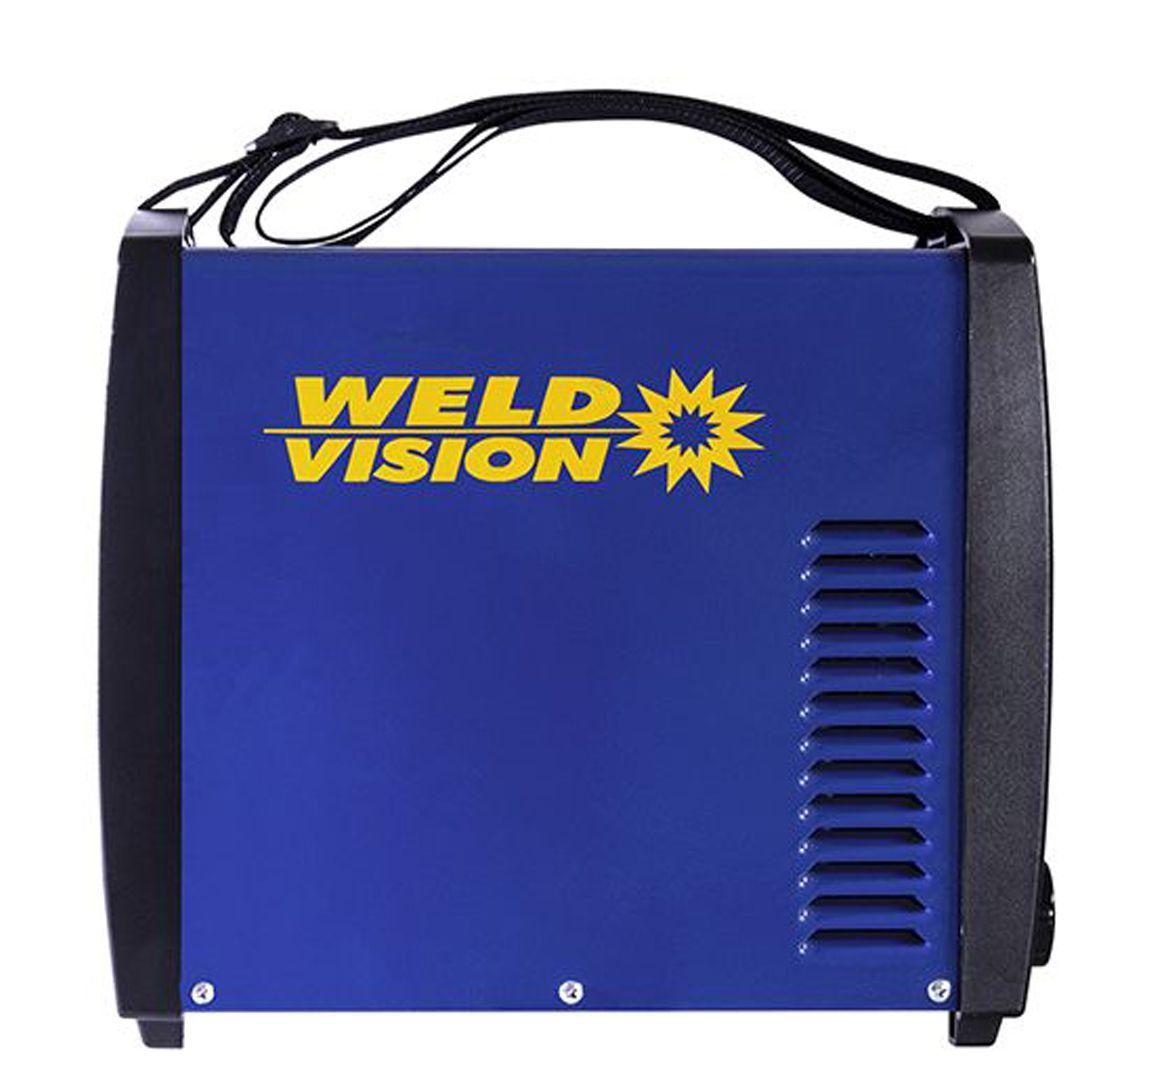 Inversora de Solda TIG Challenger 160 Pulse Weld Vision